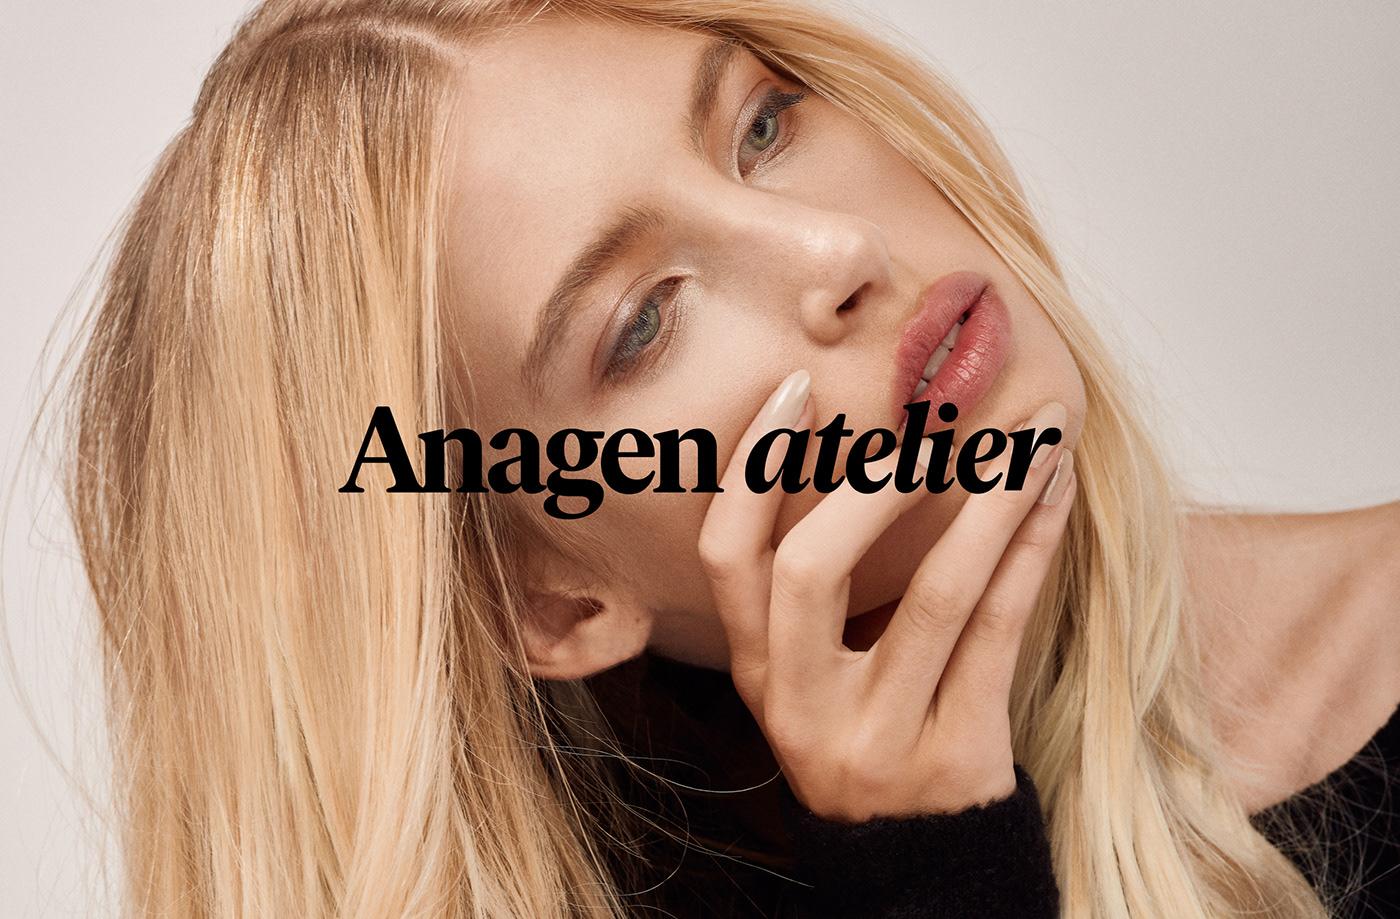 anagen salon beauty modern minimal identity feminine product extensions yungbld